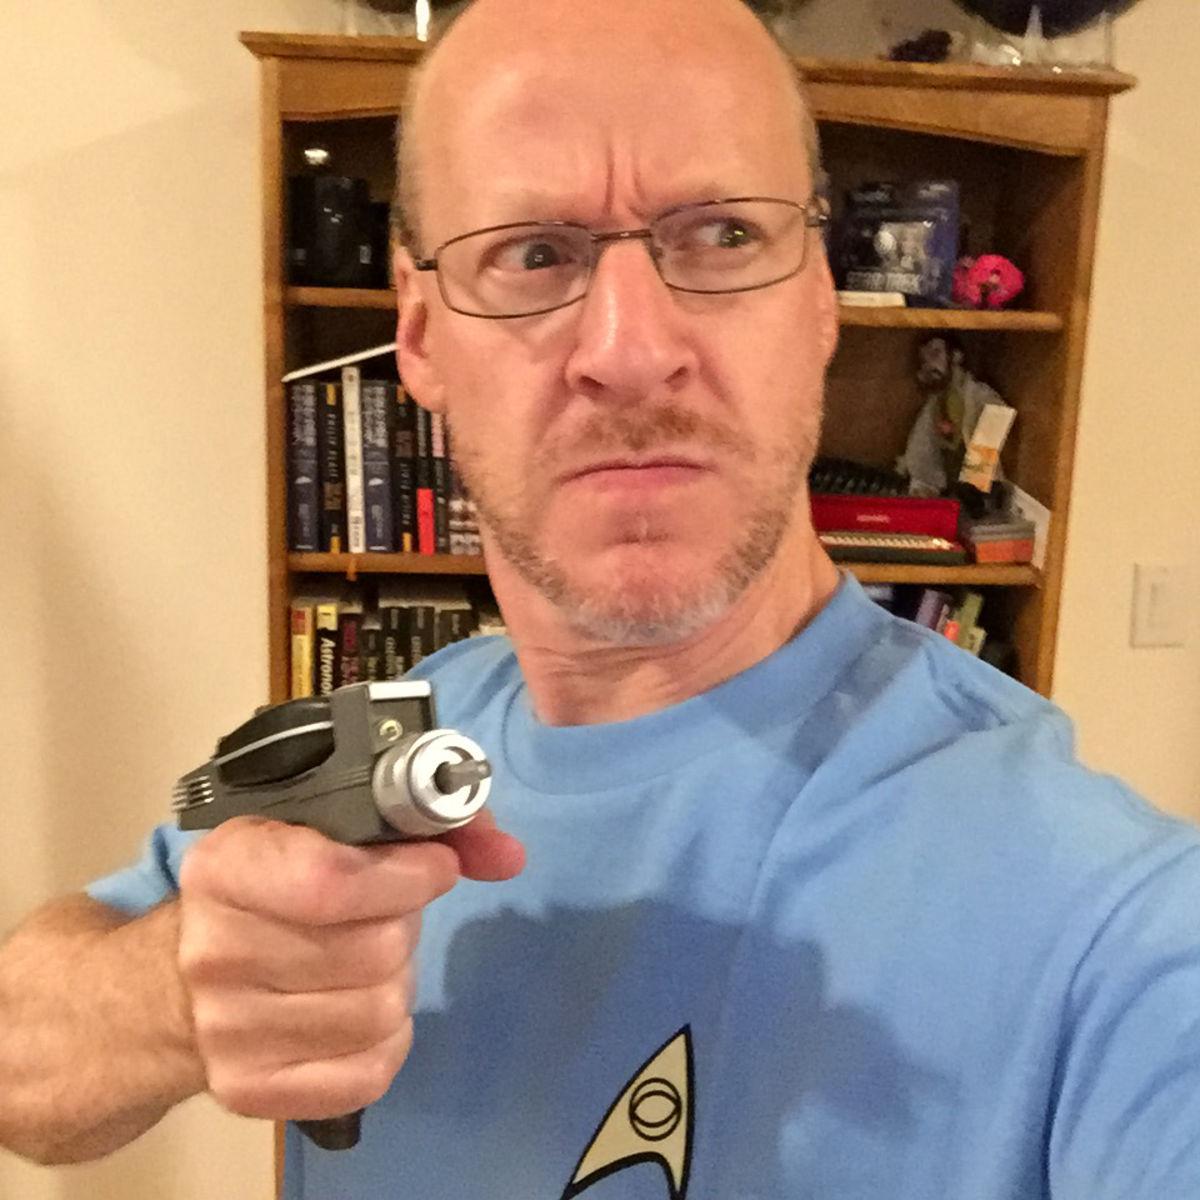 Phil Plait holding a phaser